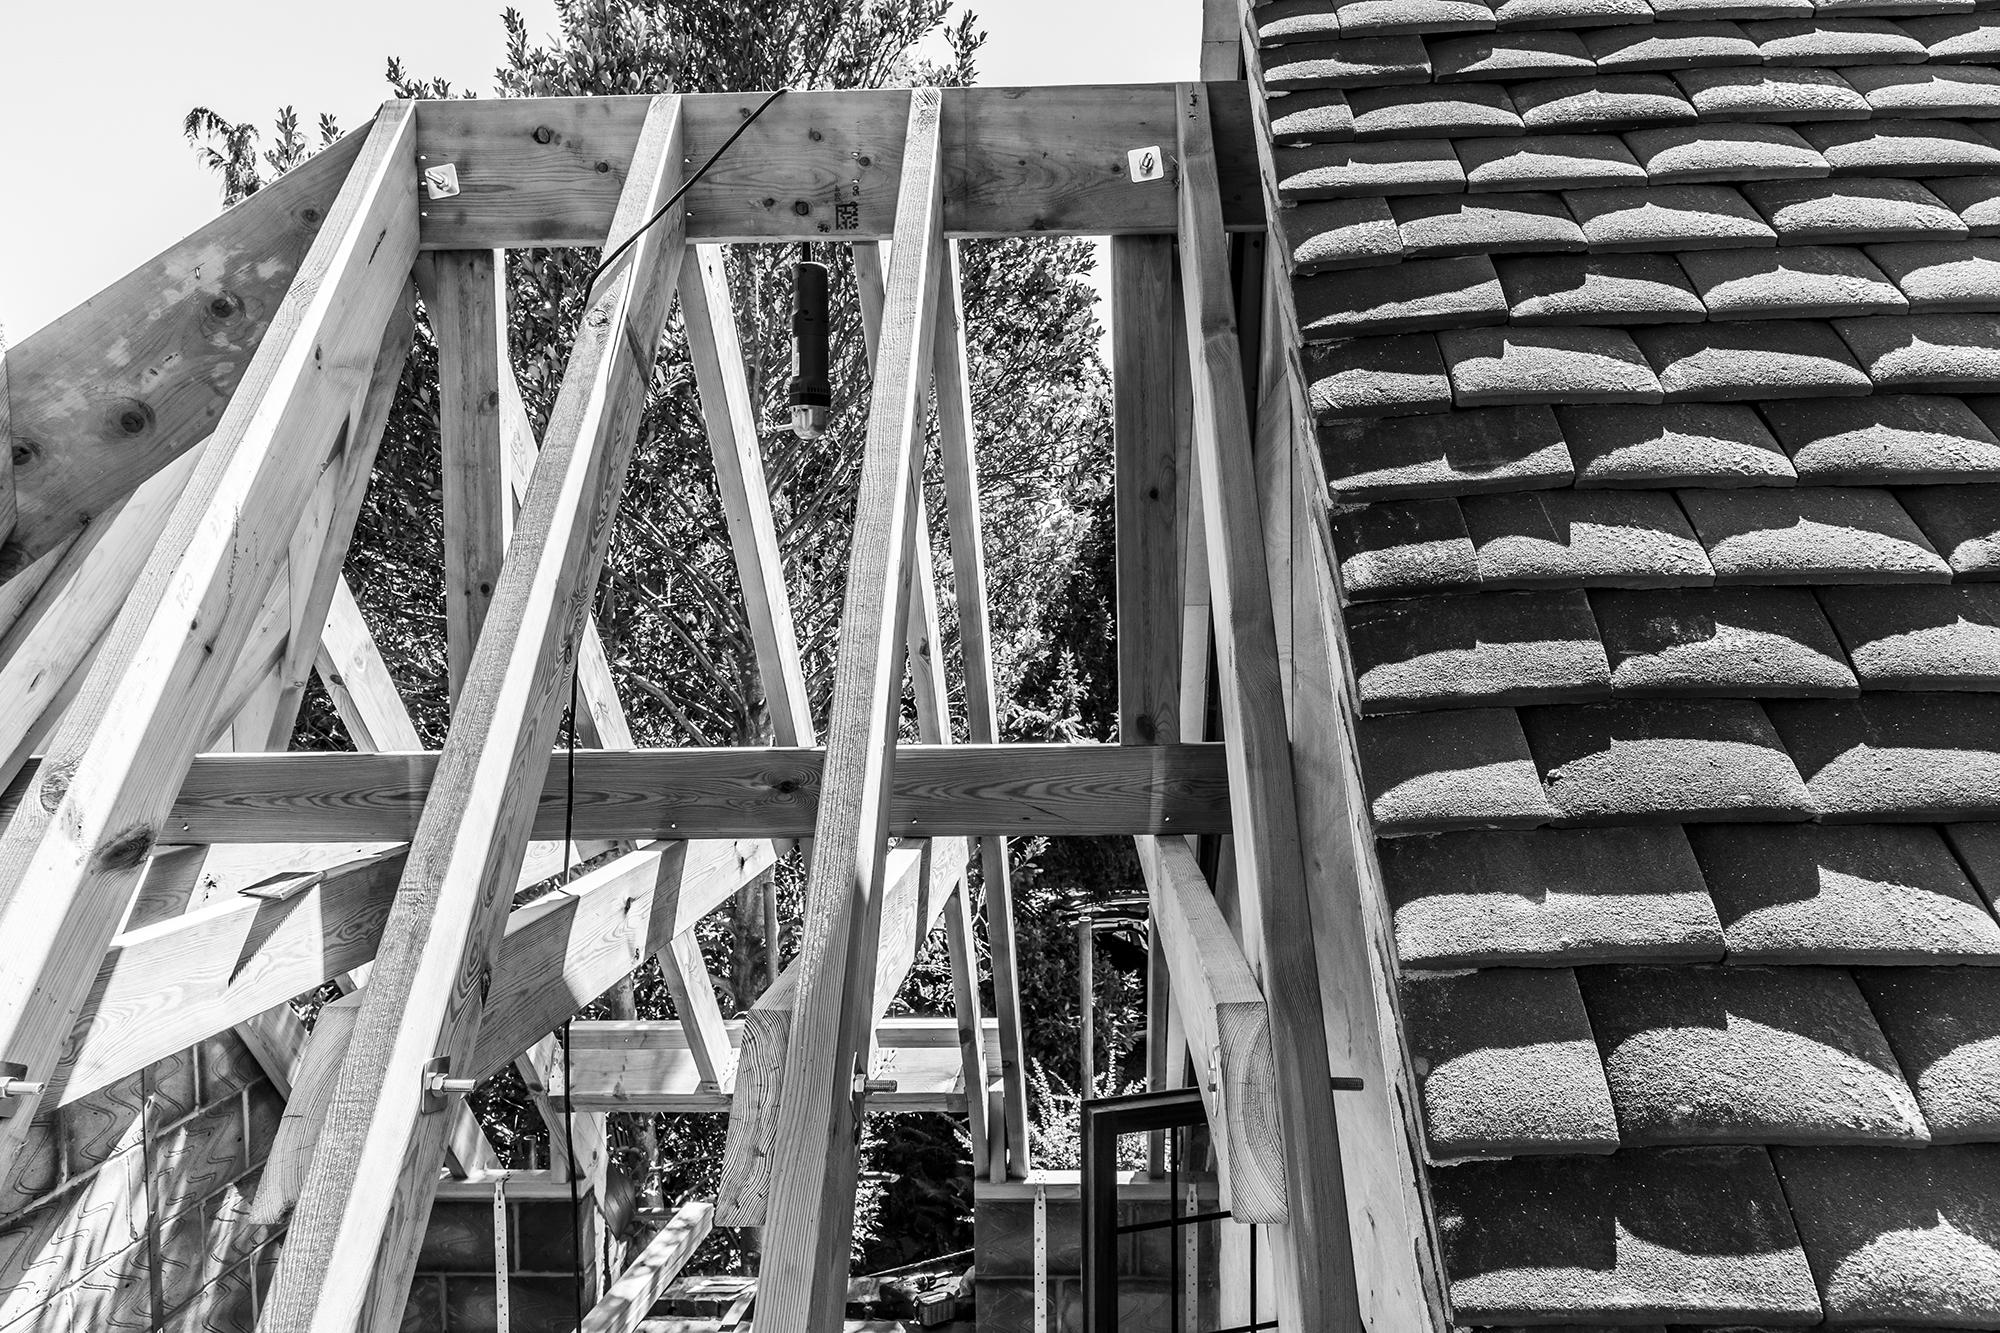 Greenshaw_Construction2_39.jpg